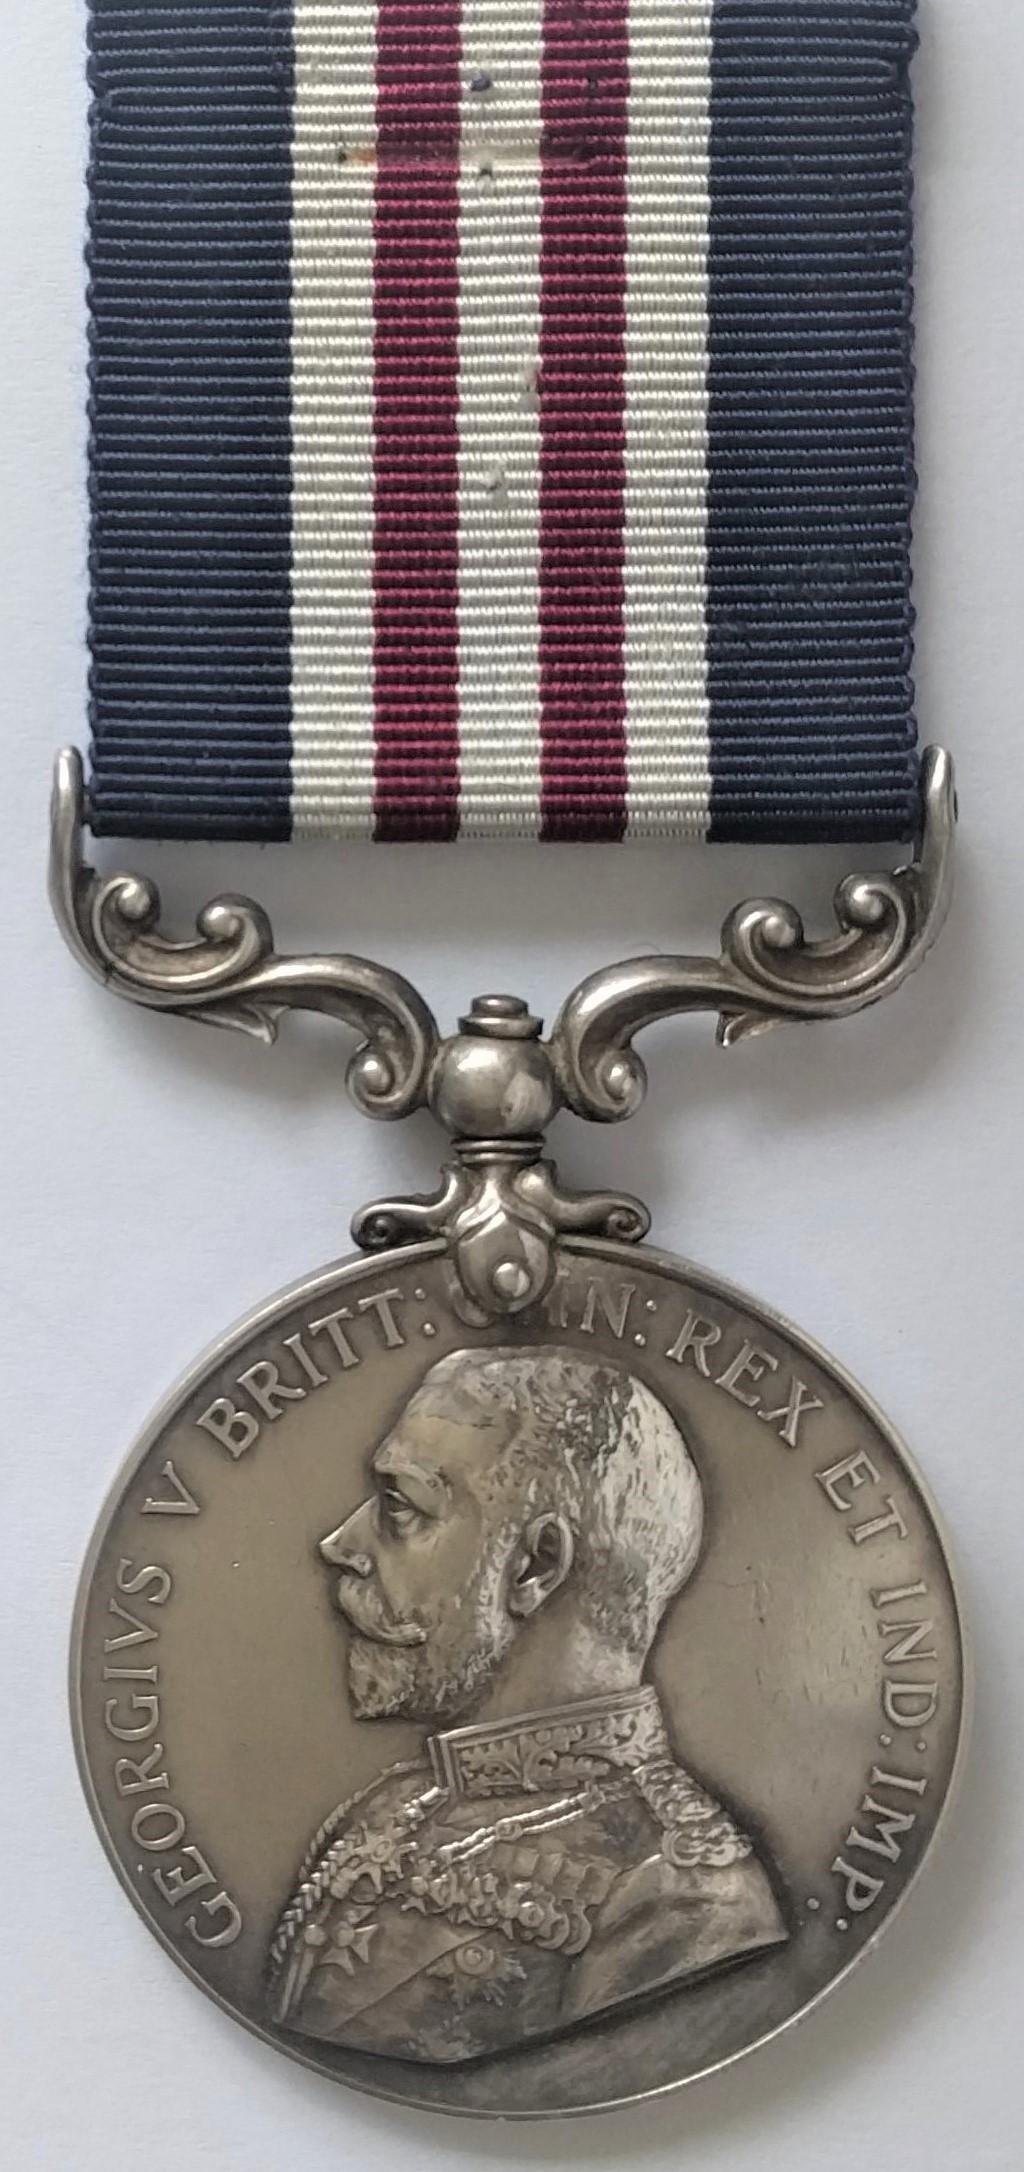 BRANDI: Replica medals nz